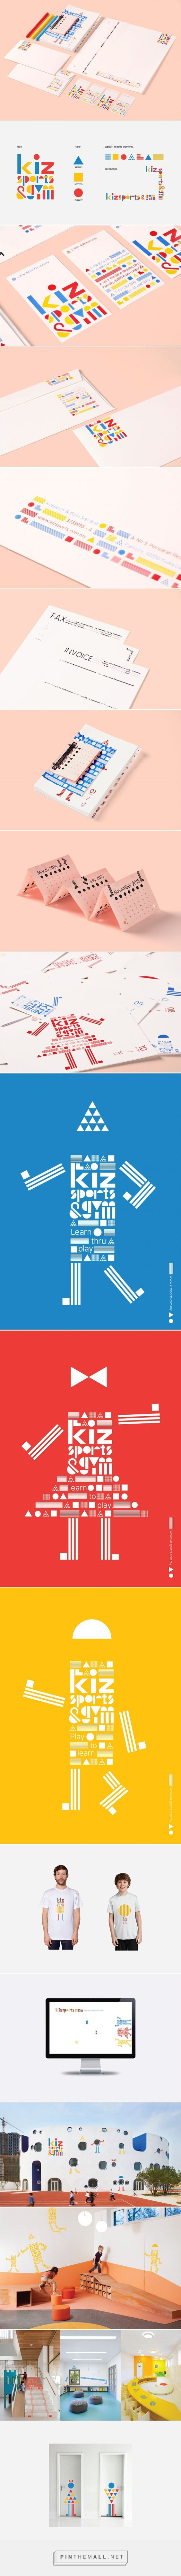 Kizsports and Gym Branding on Behance | Fivestar Branding – Design and Branding Agency & Inspiration Gallery